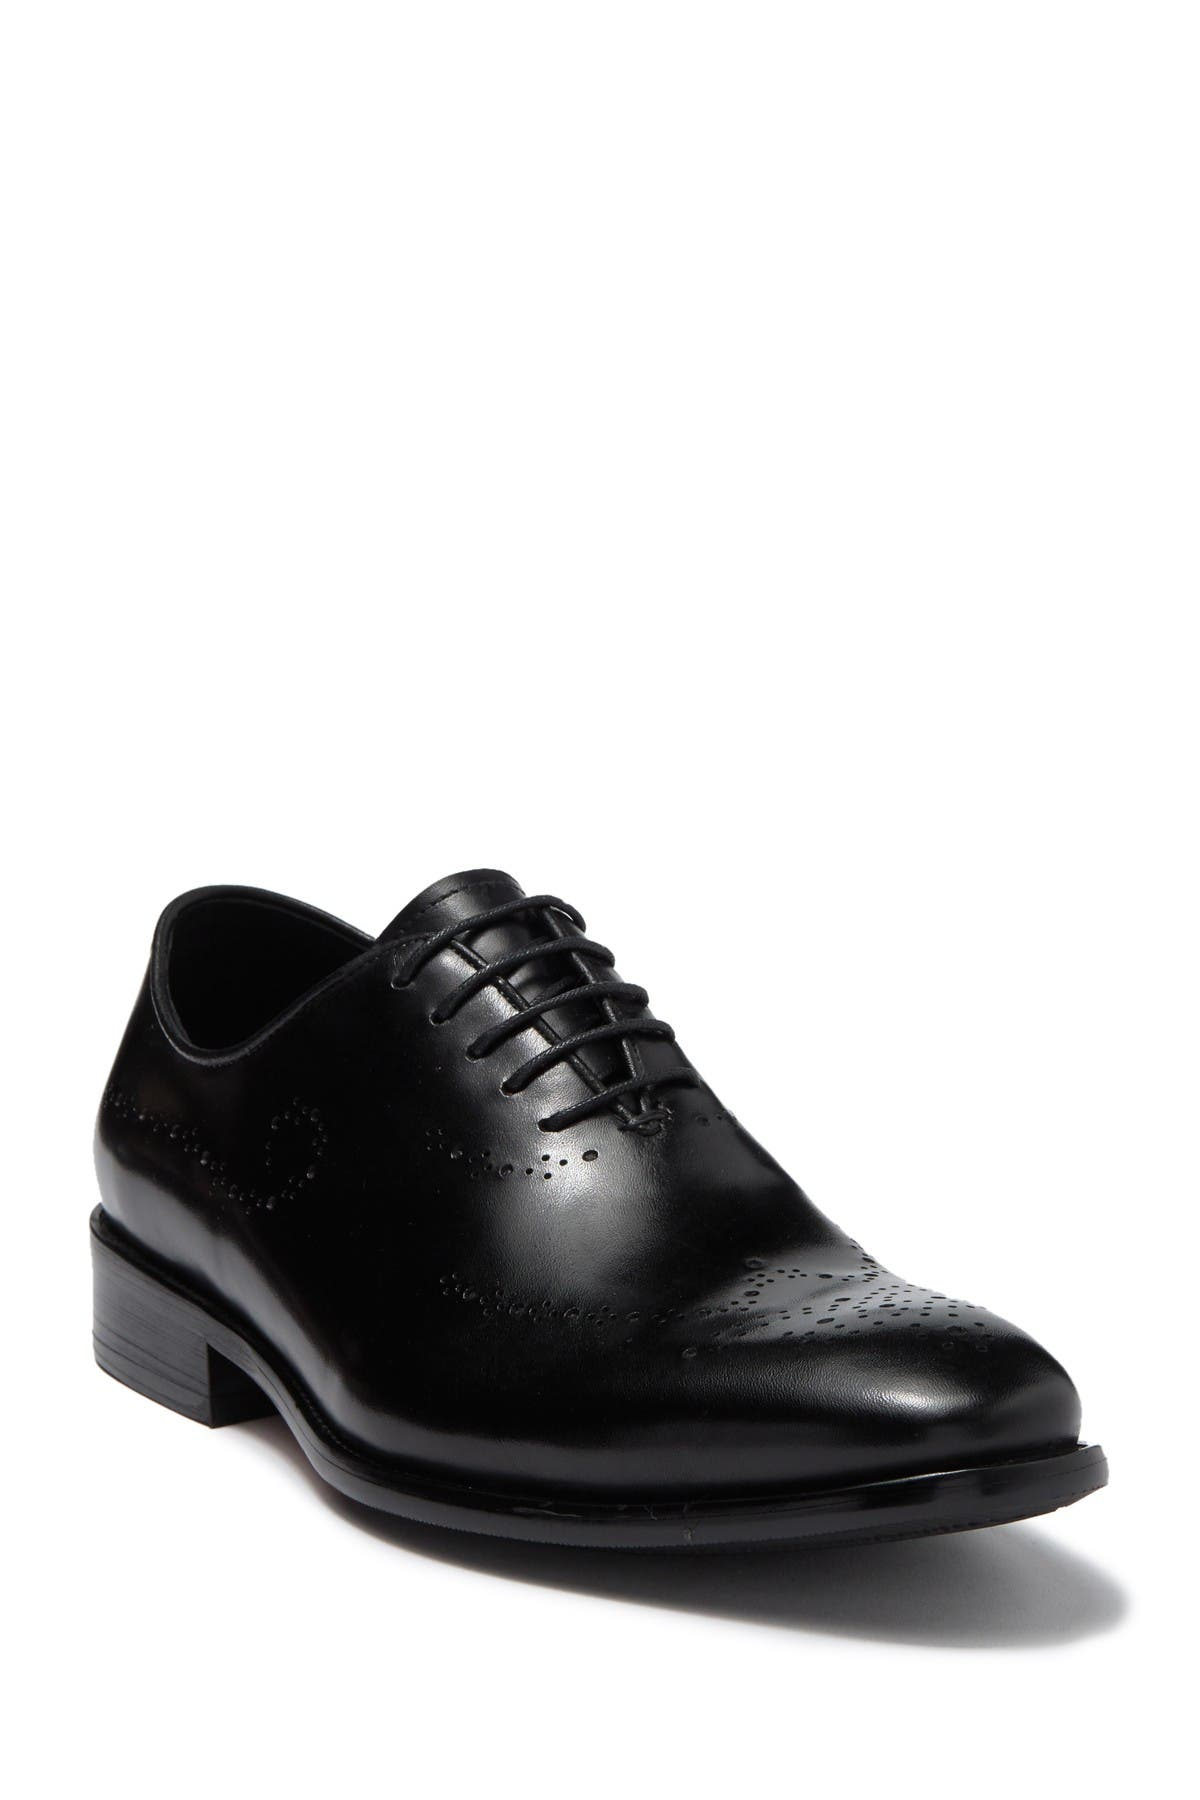 Image of MAISON FORTE Gazi Wholecut Leather Oxford